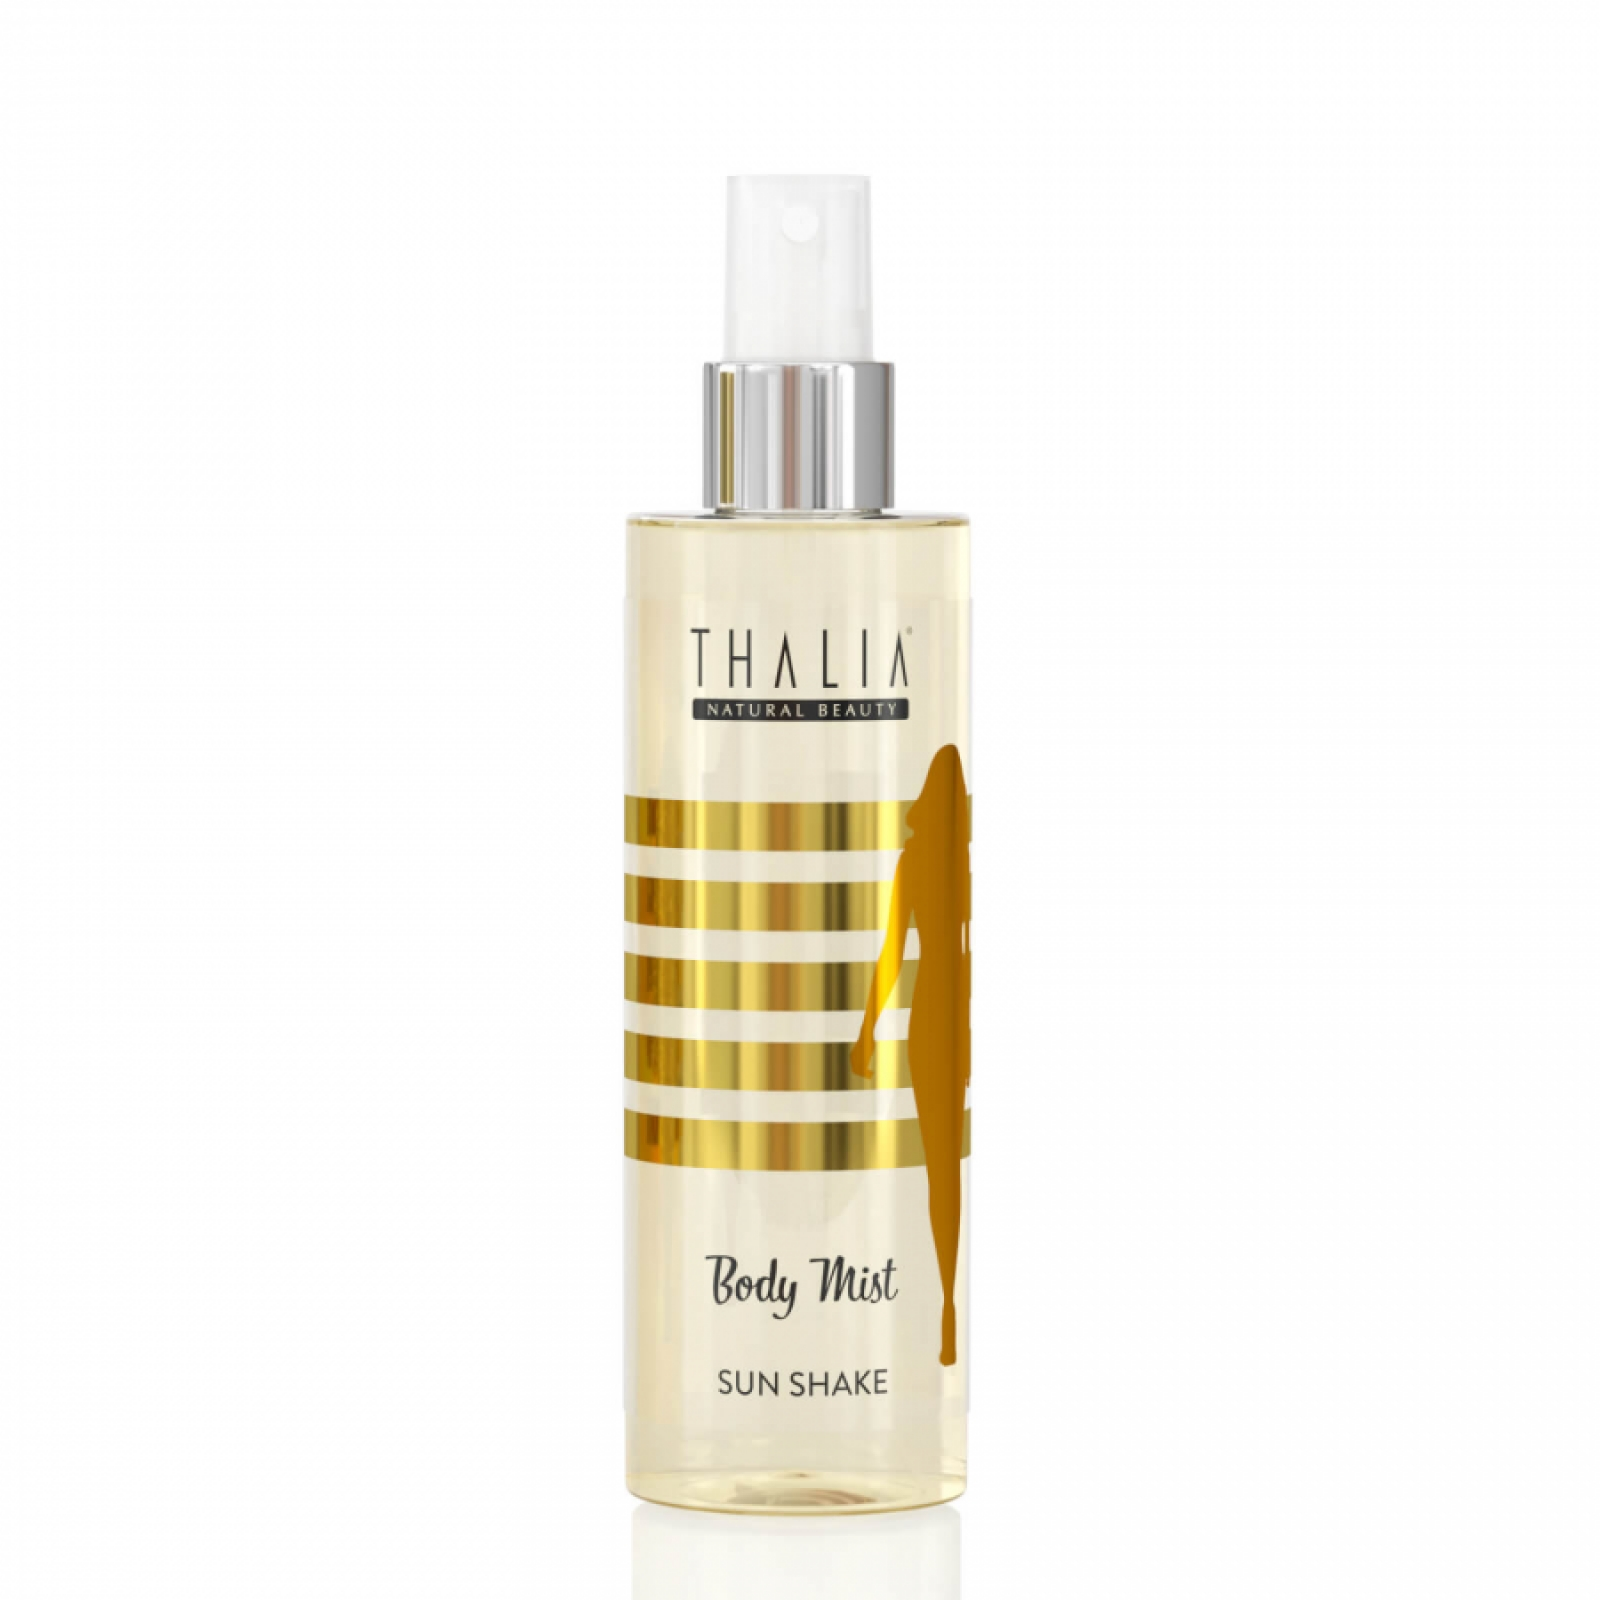 Thalia Sun Shake Body Mist 200 ml